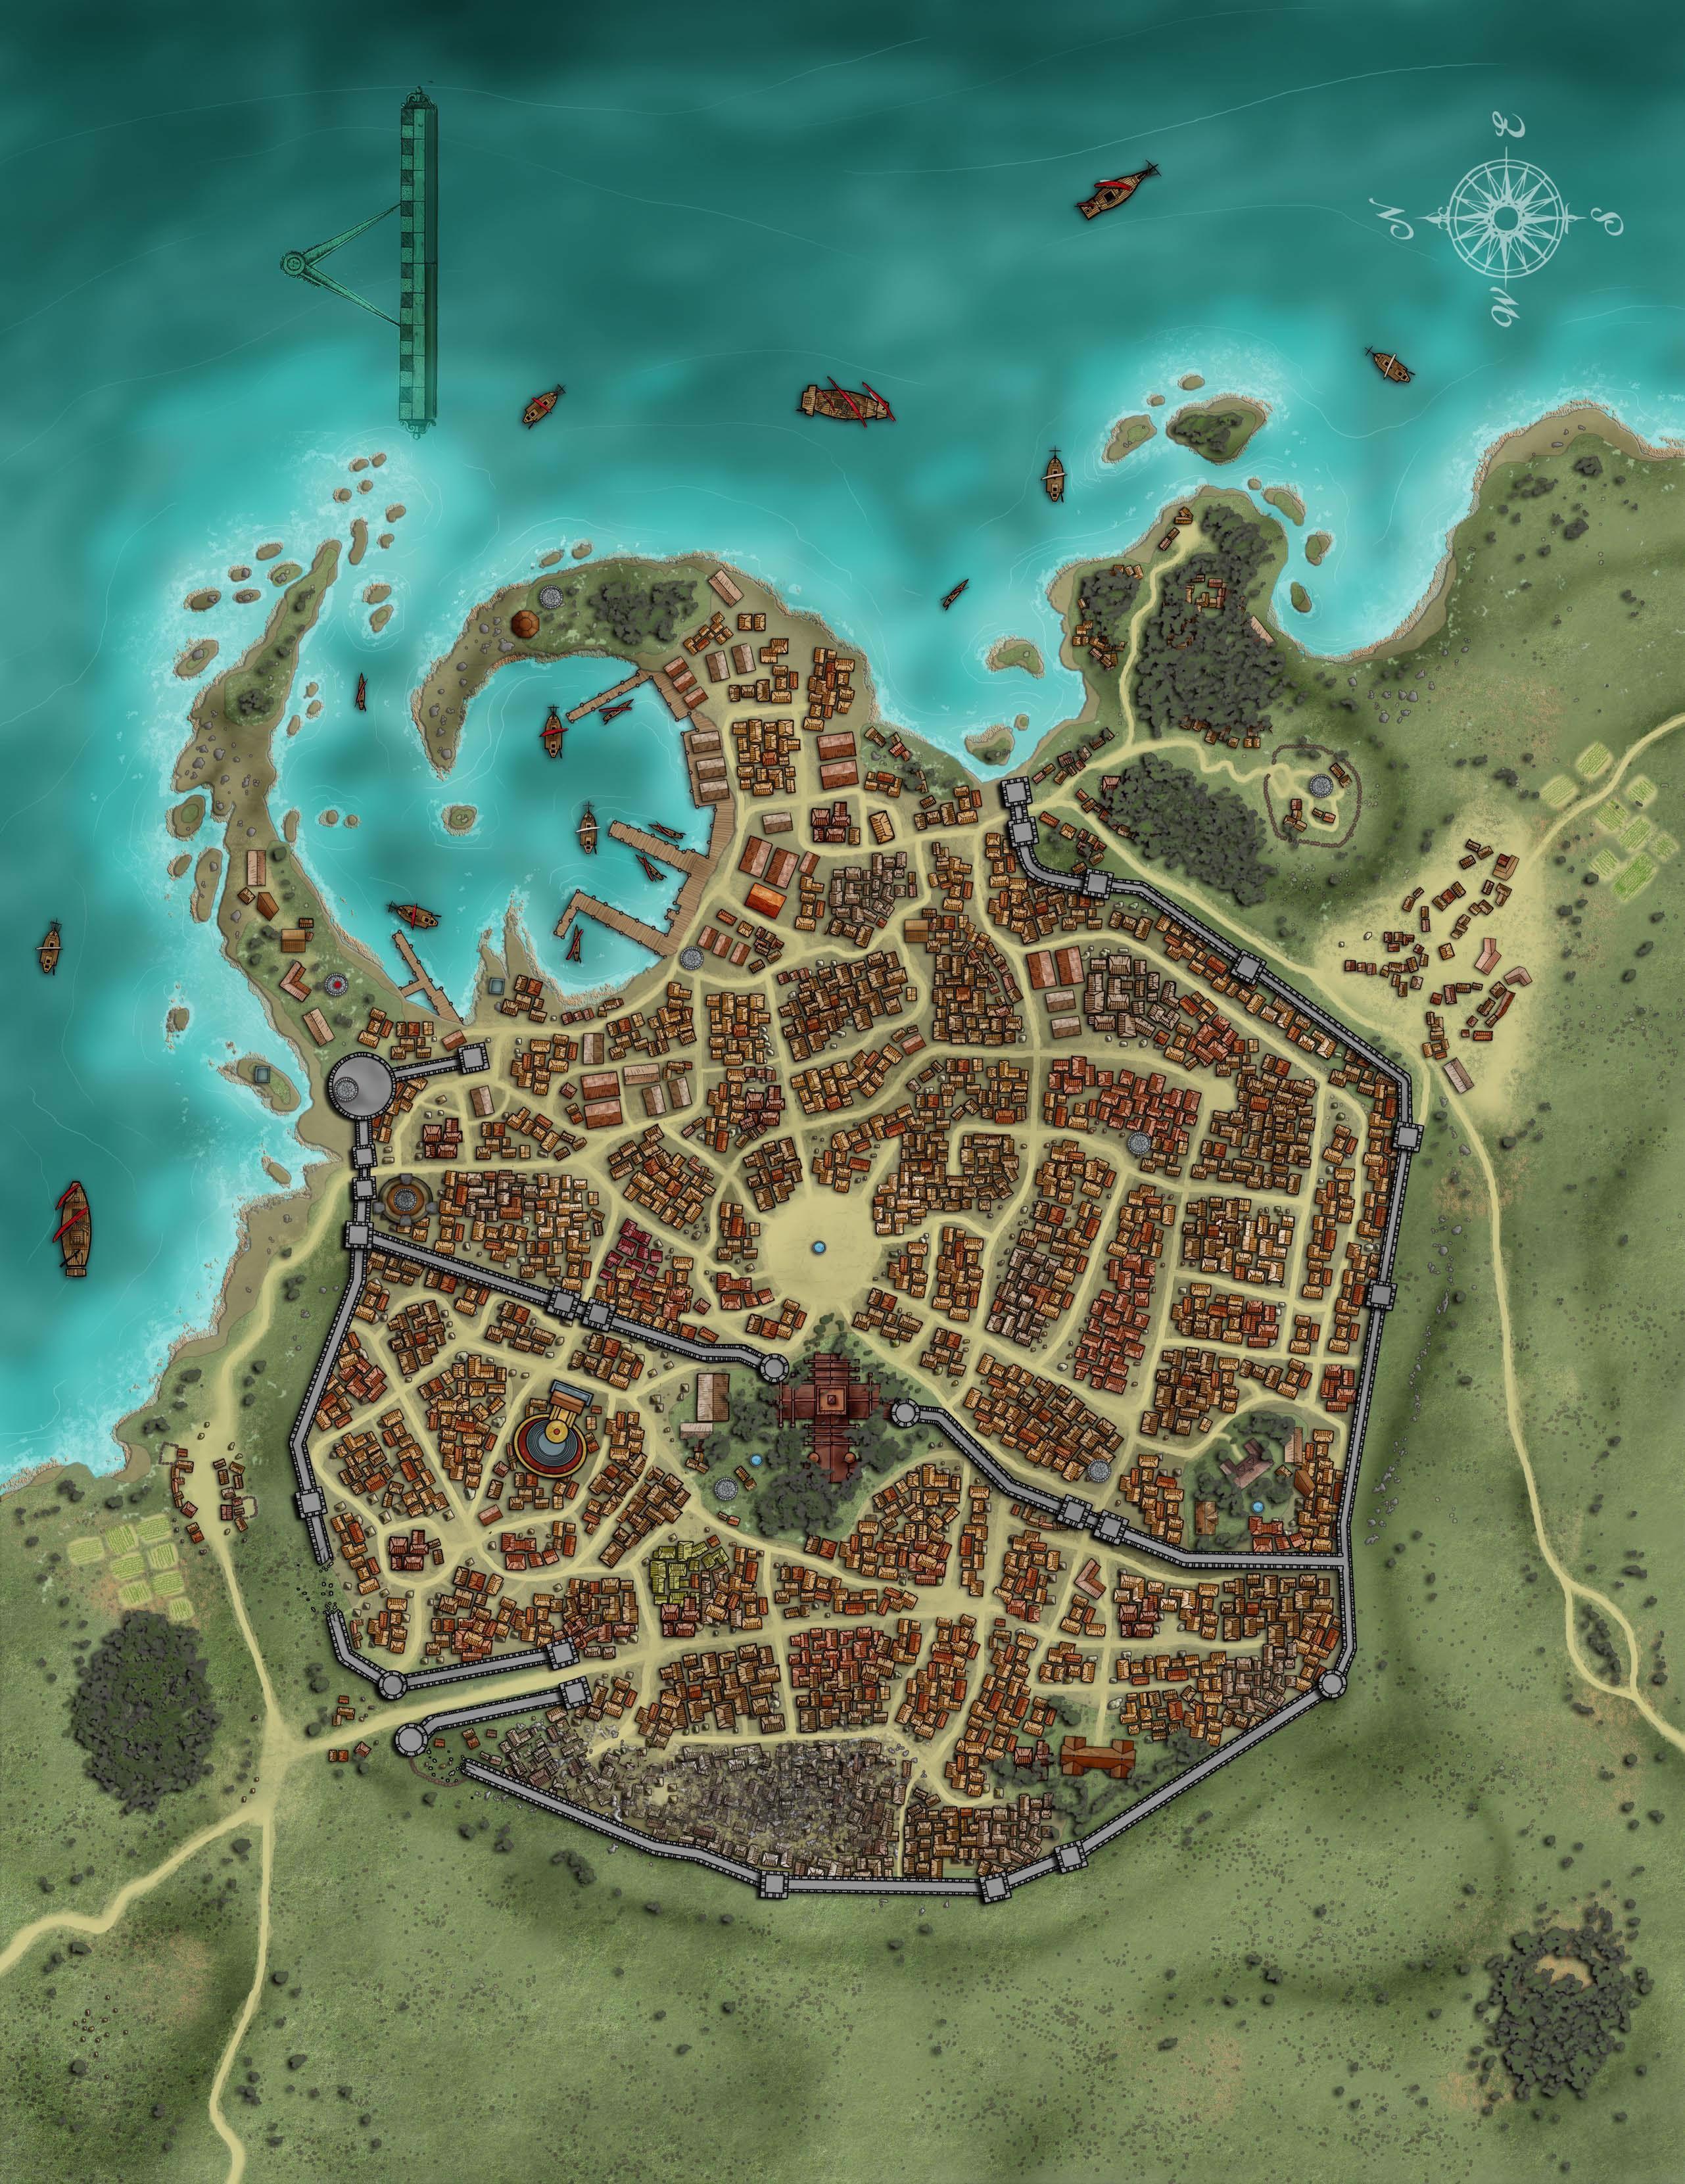 Town Castle Town Harbor Towns D D Maps Doomed Gallery Fantasielandschaft Kartographie Minecraft Mittelalter